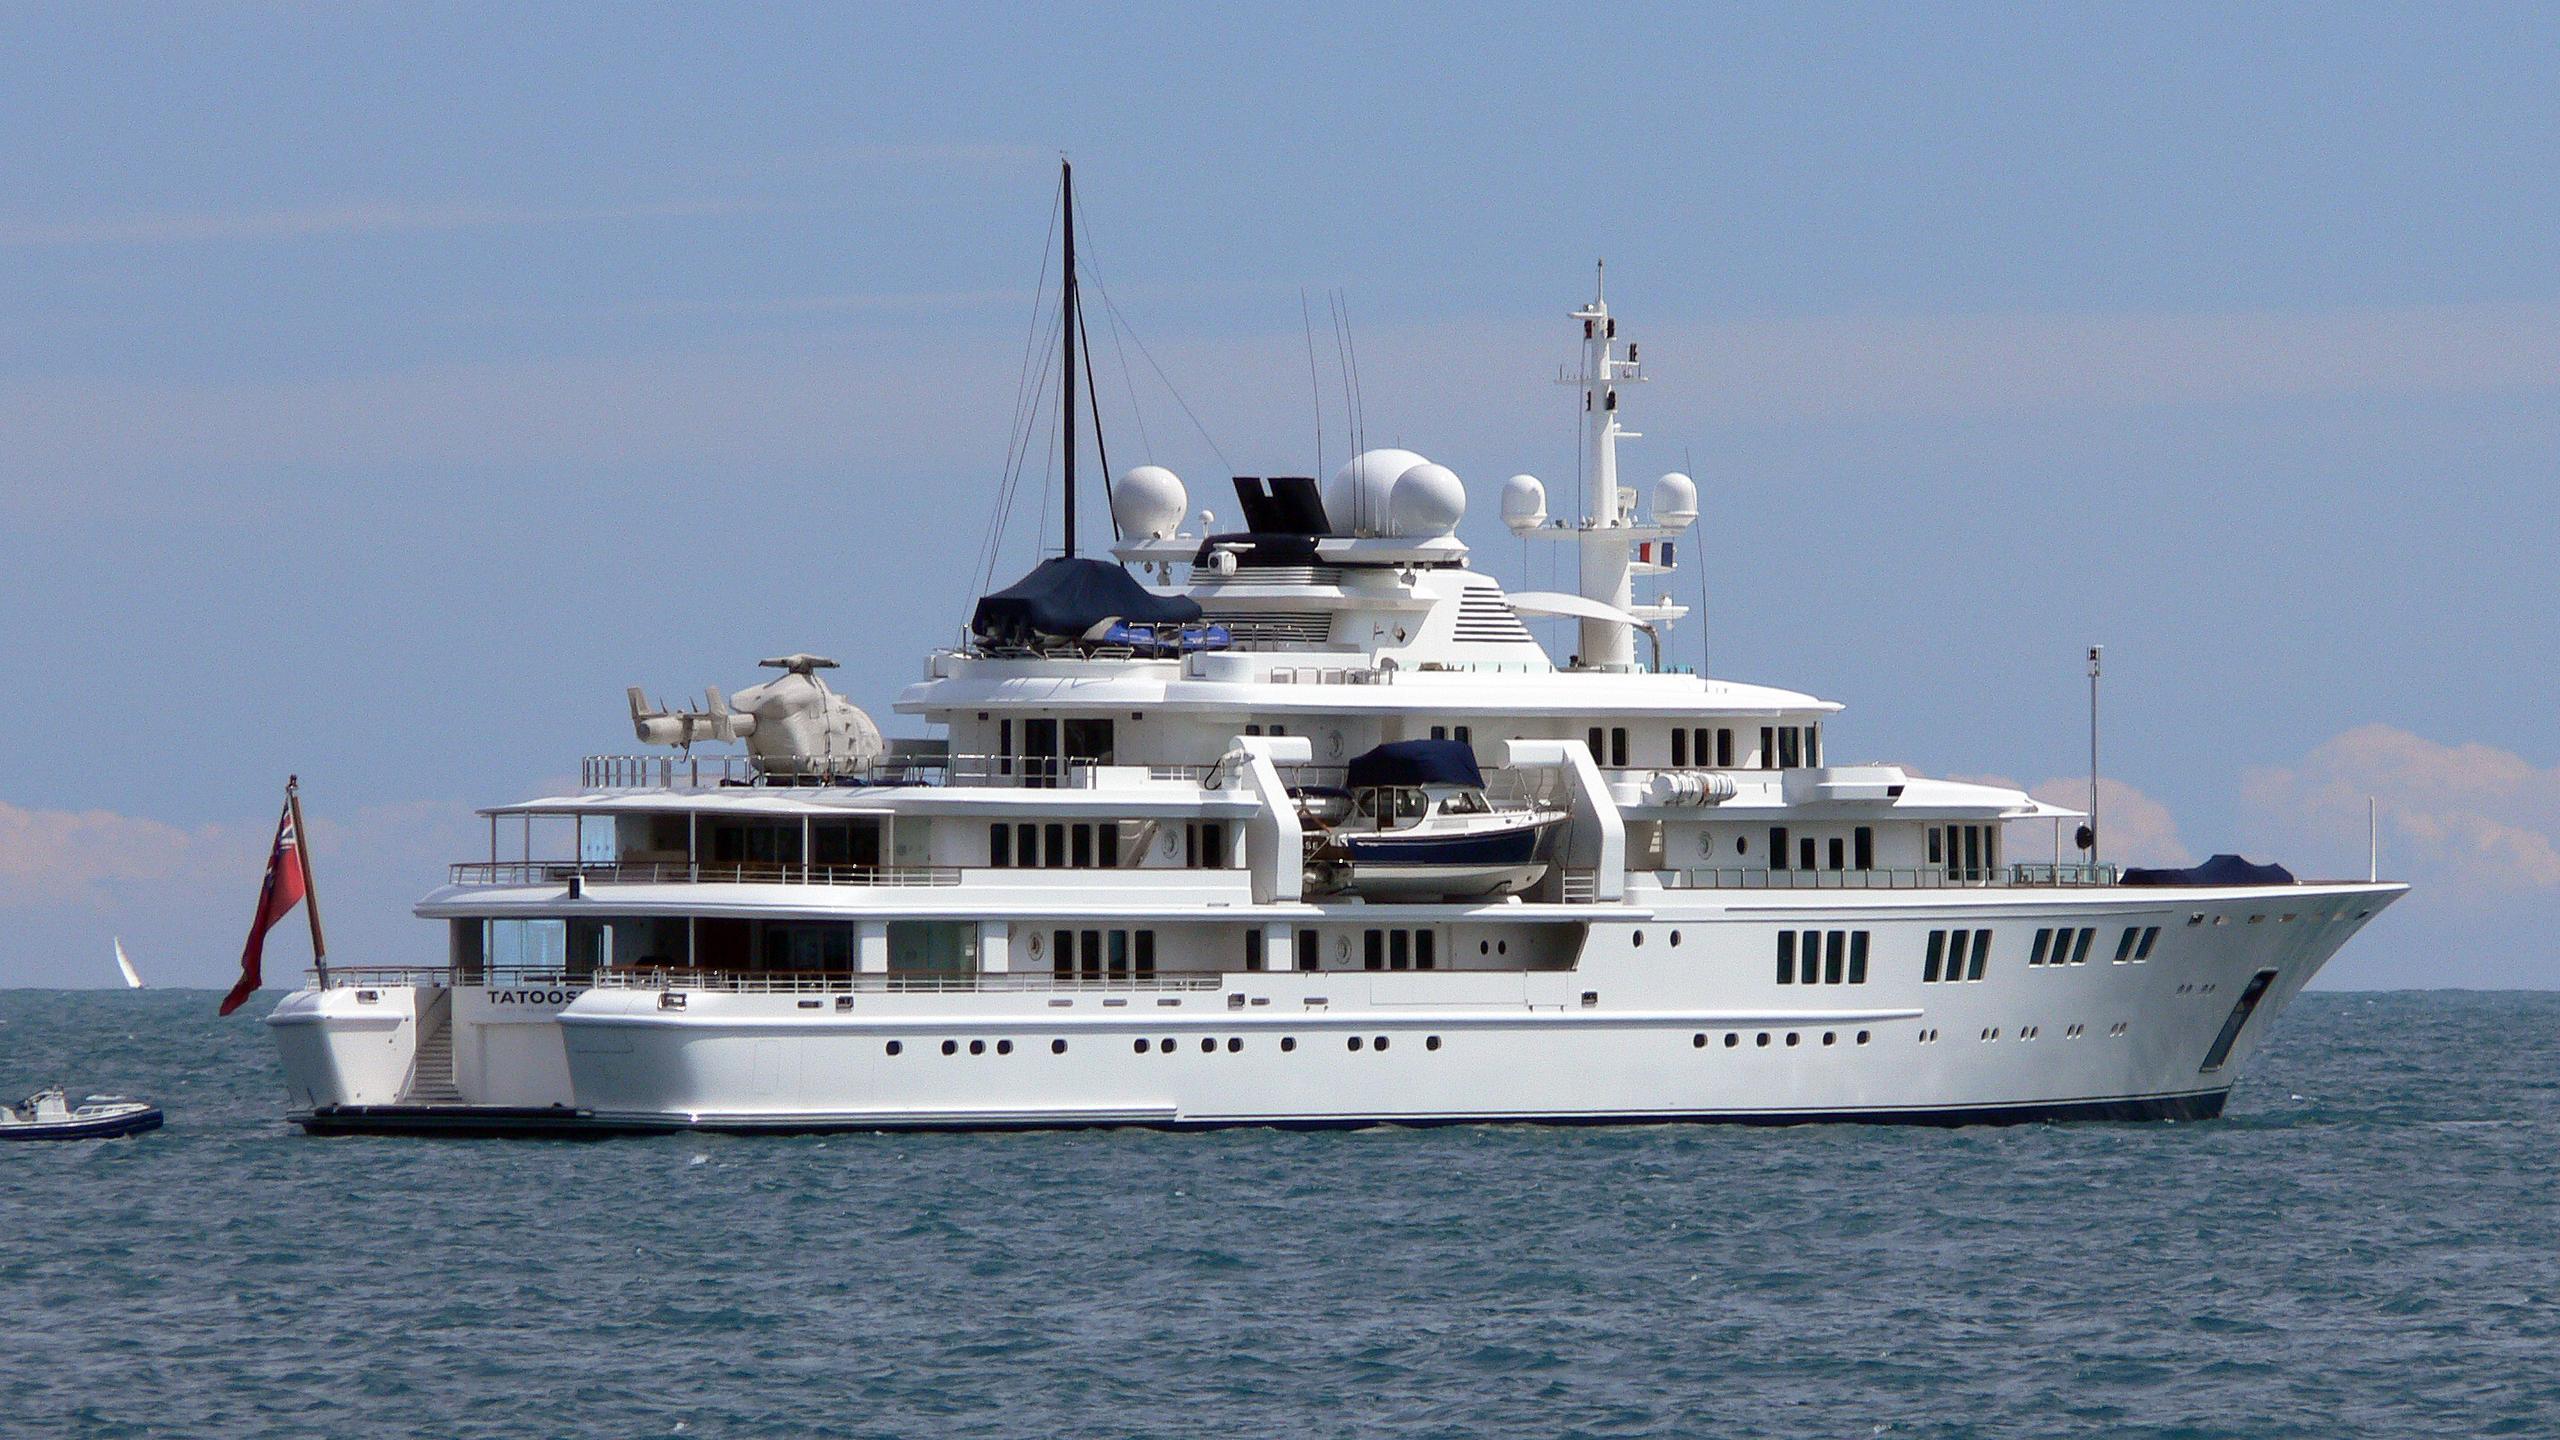 tatoosh-motor-yacht-nobiskrug-2000-92m-stern-half-profile